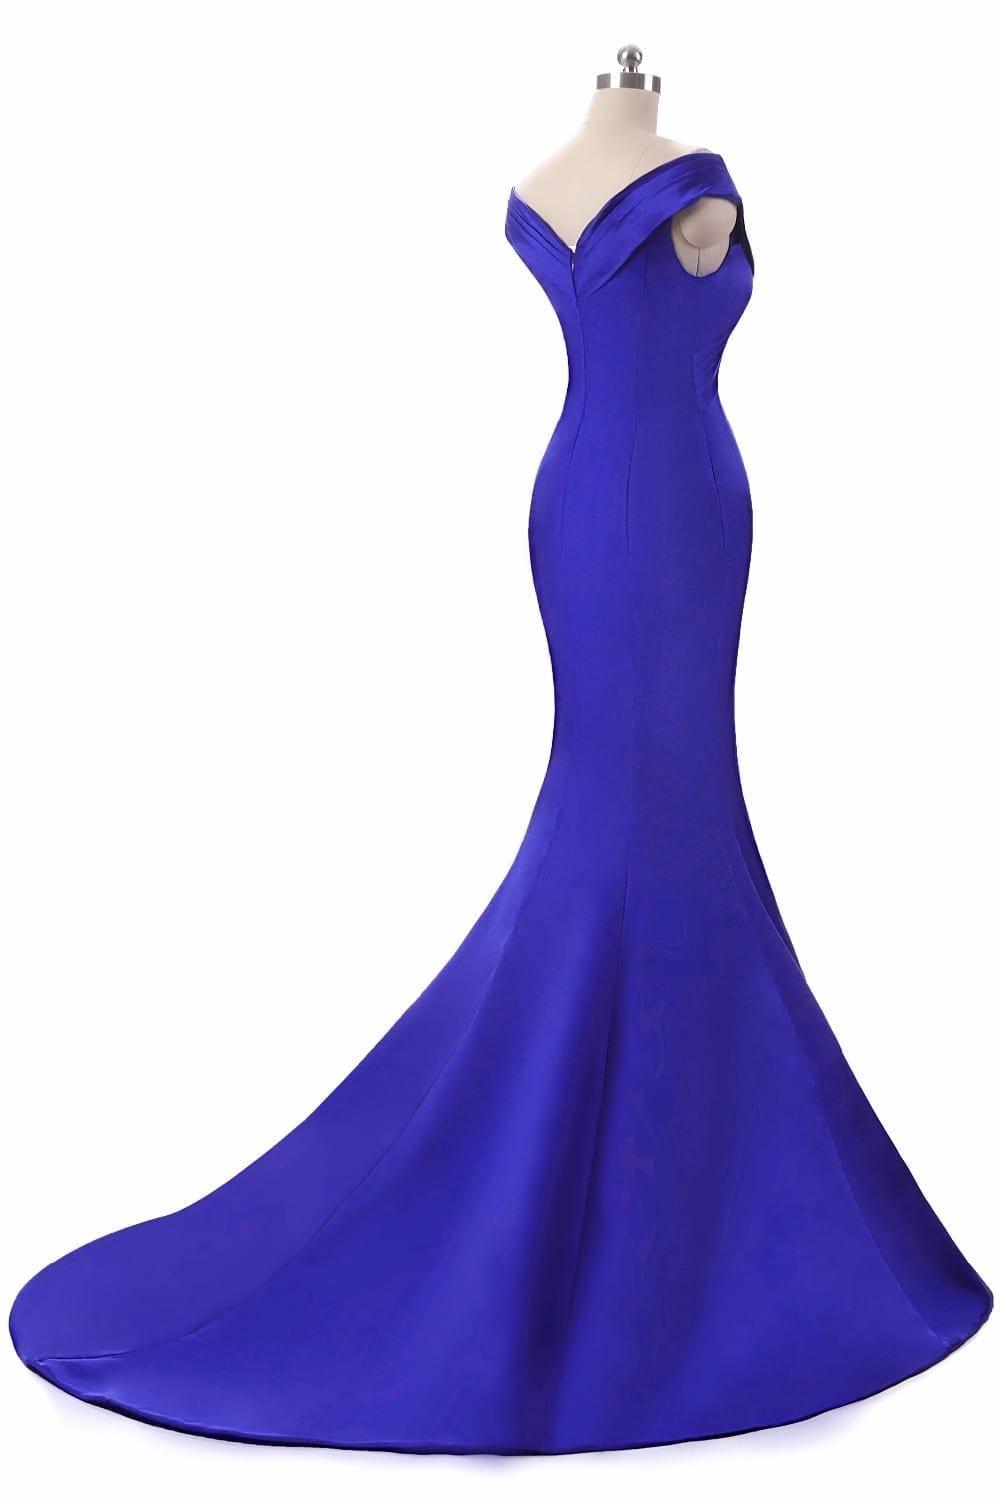 Royal Blue V-neck Floor Length Mermaid Long Evening Dress